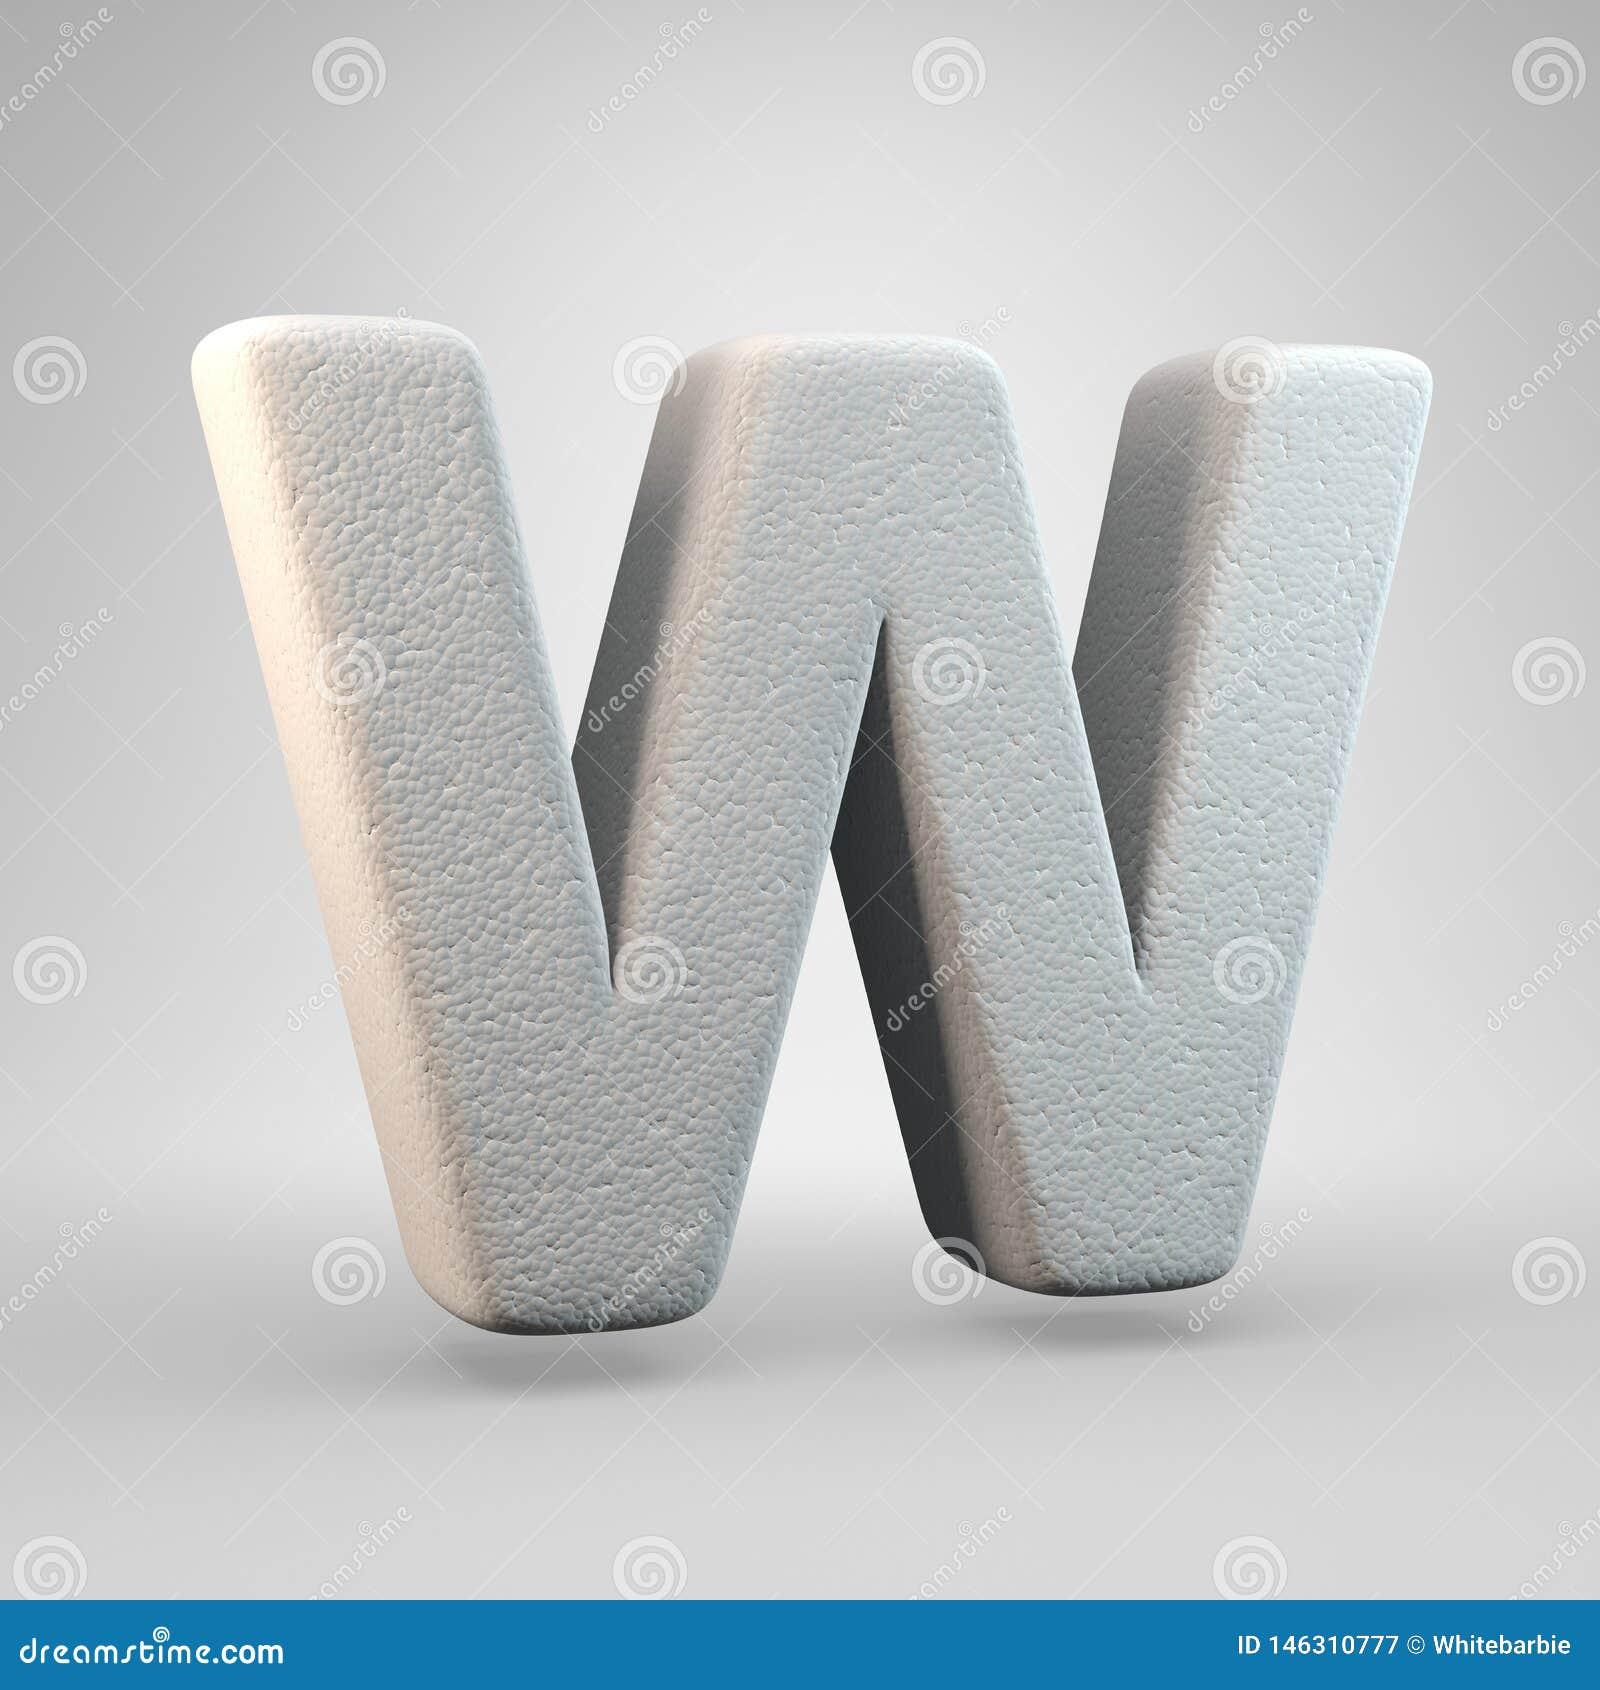 Volumetric construction foam uppercase letter W isolated on white background